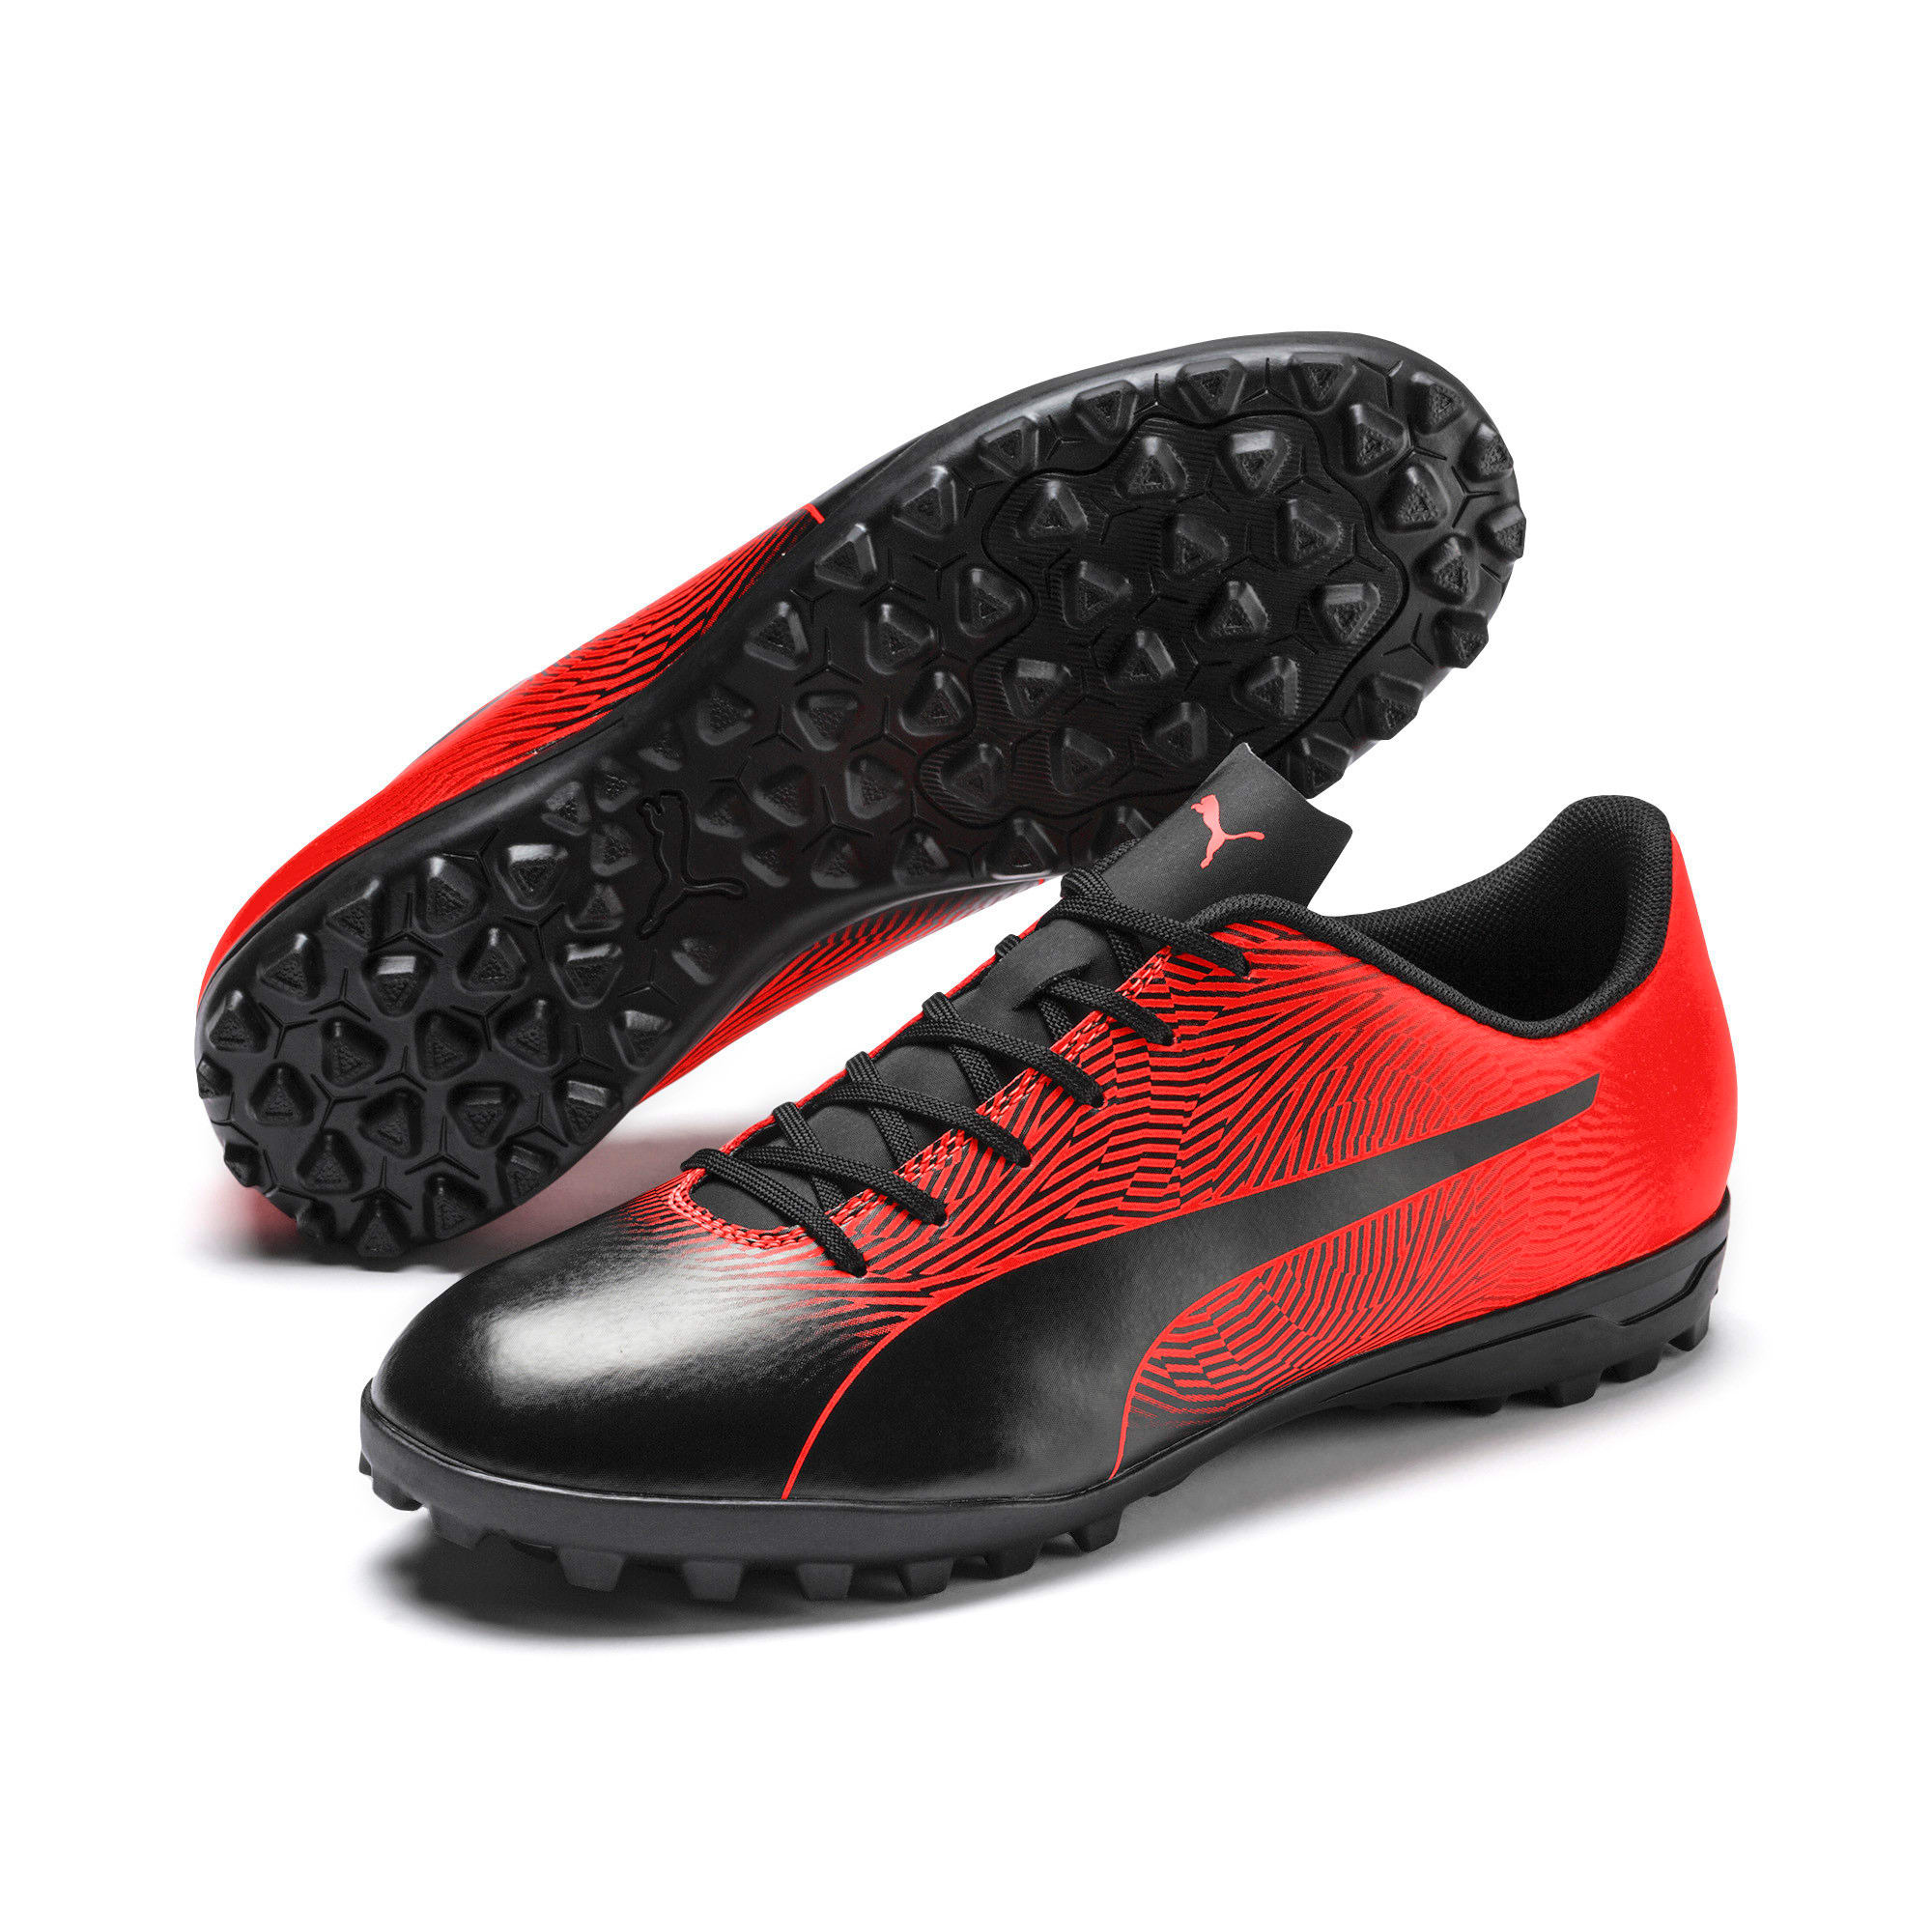 Thumbnail 2 of PUMA Spirit II TT Men's Soccer Shoes, Puma Black-Nrgy Red, medium